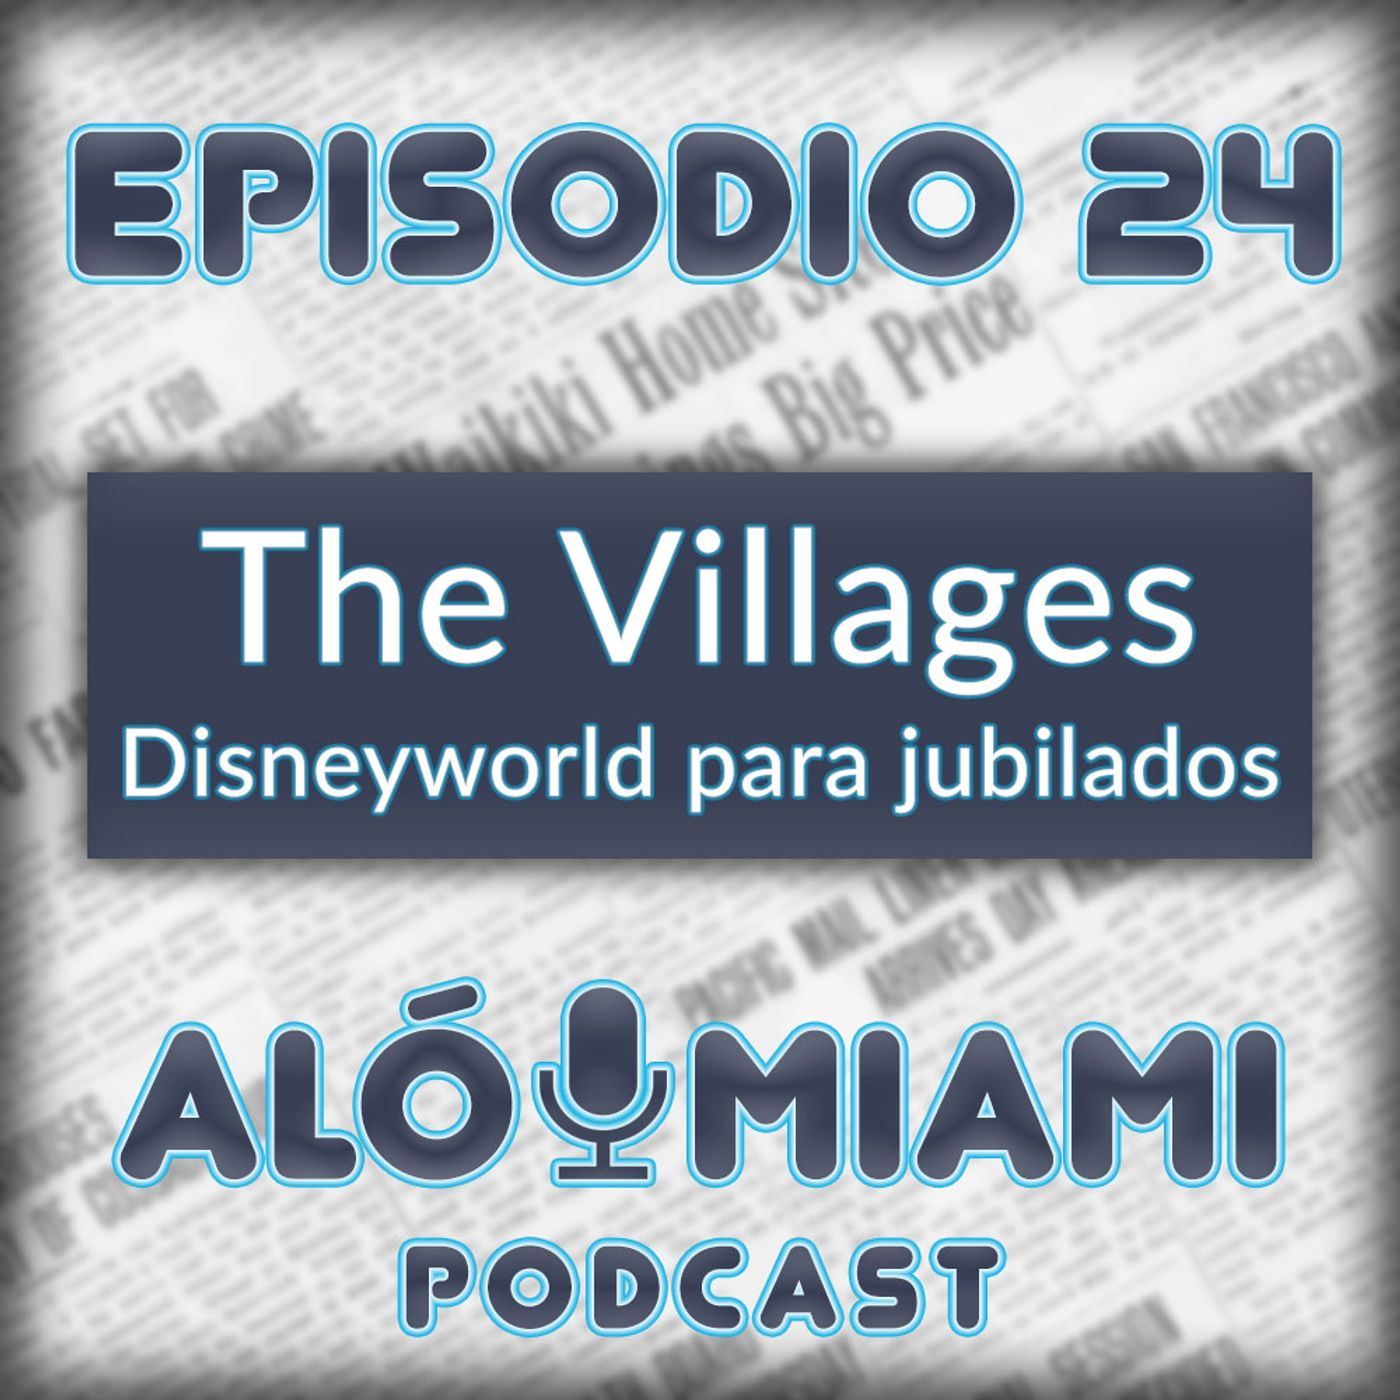 Aló Miami - Ep. 24 - Disneyworld para jubilados